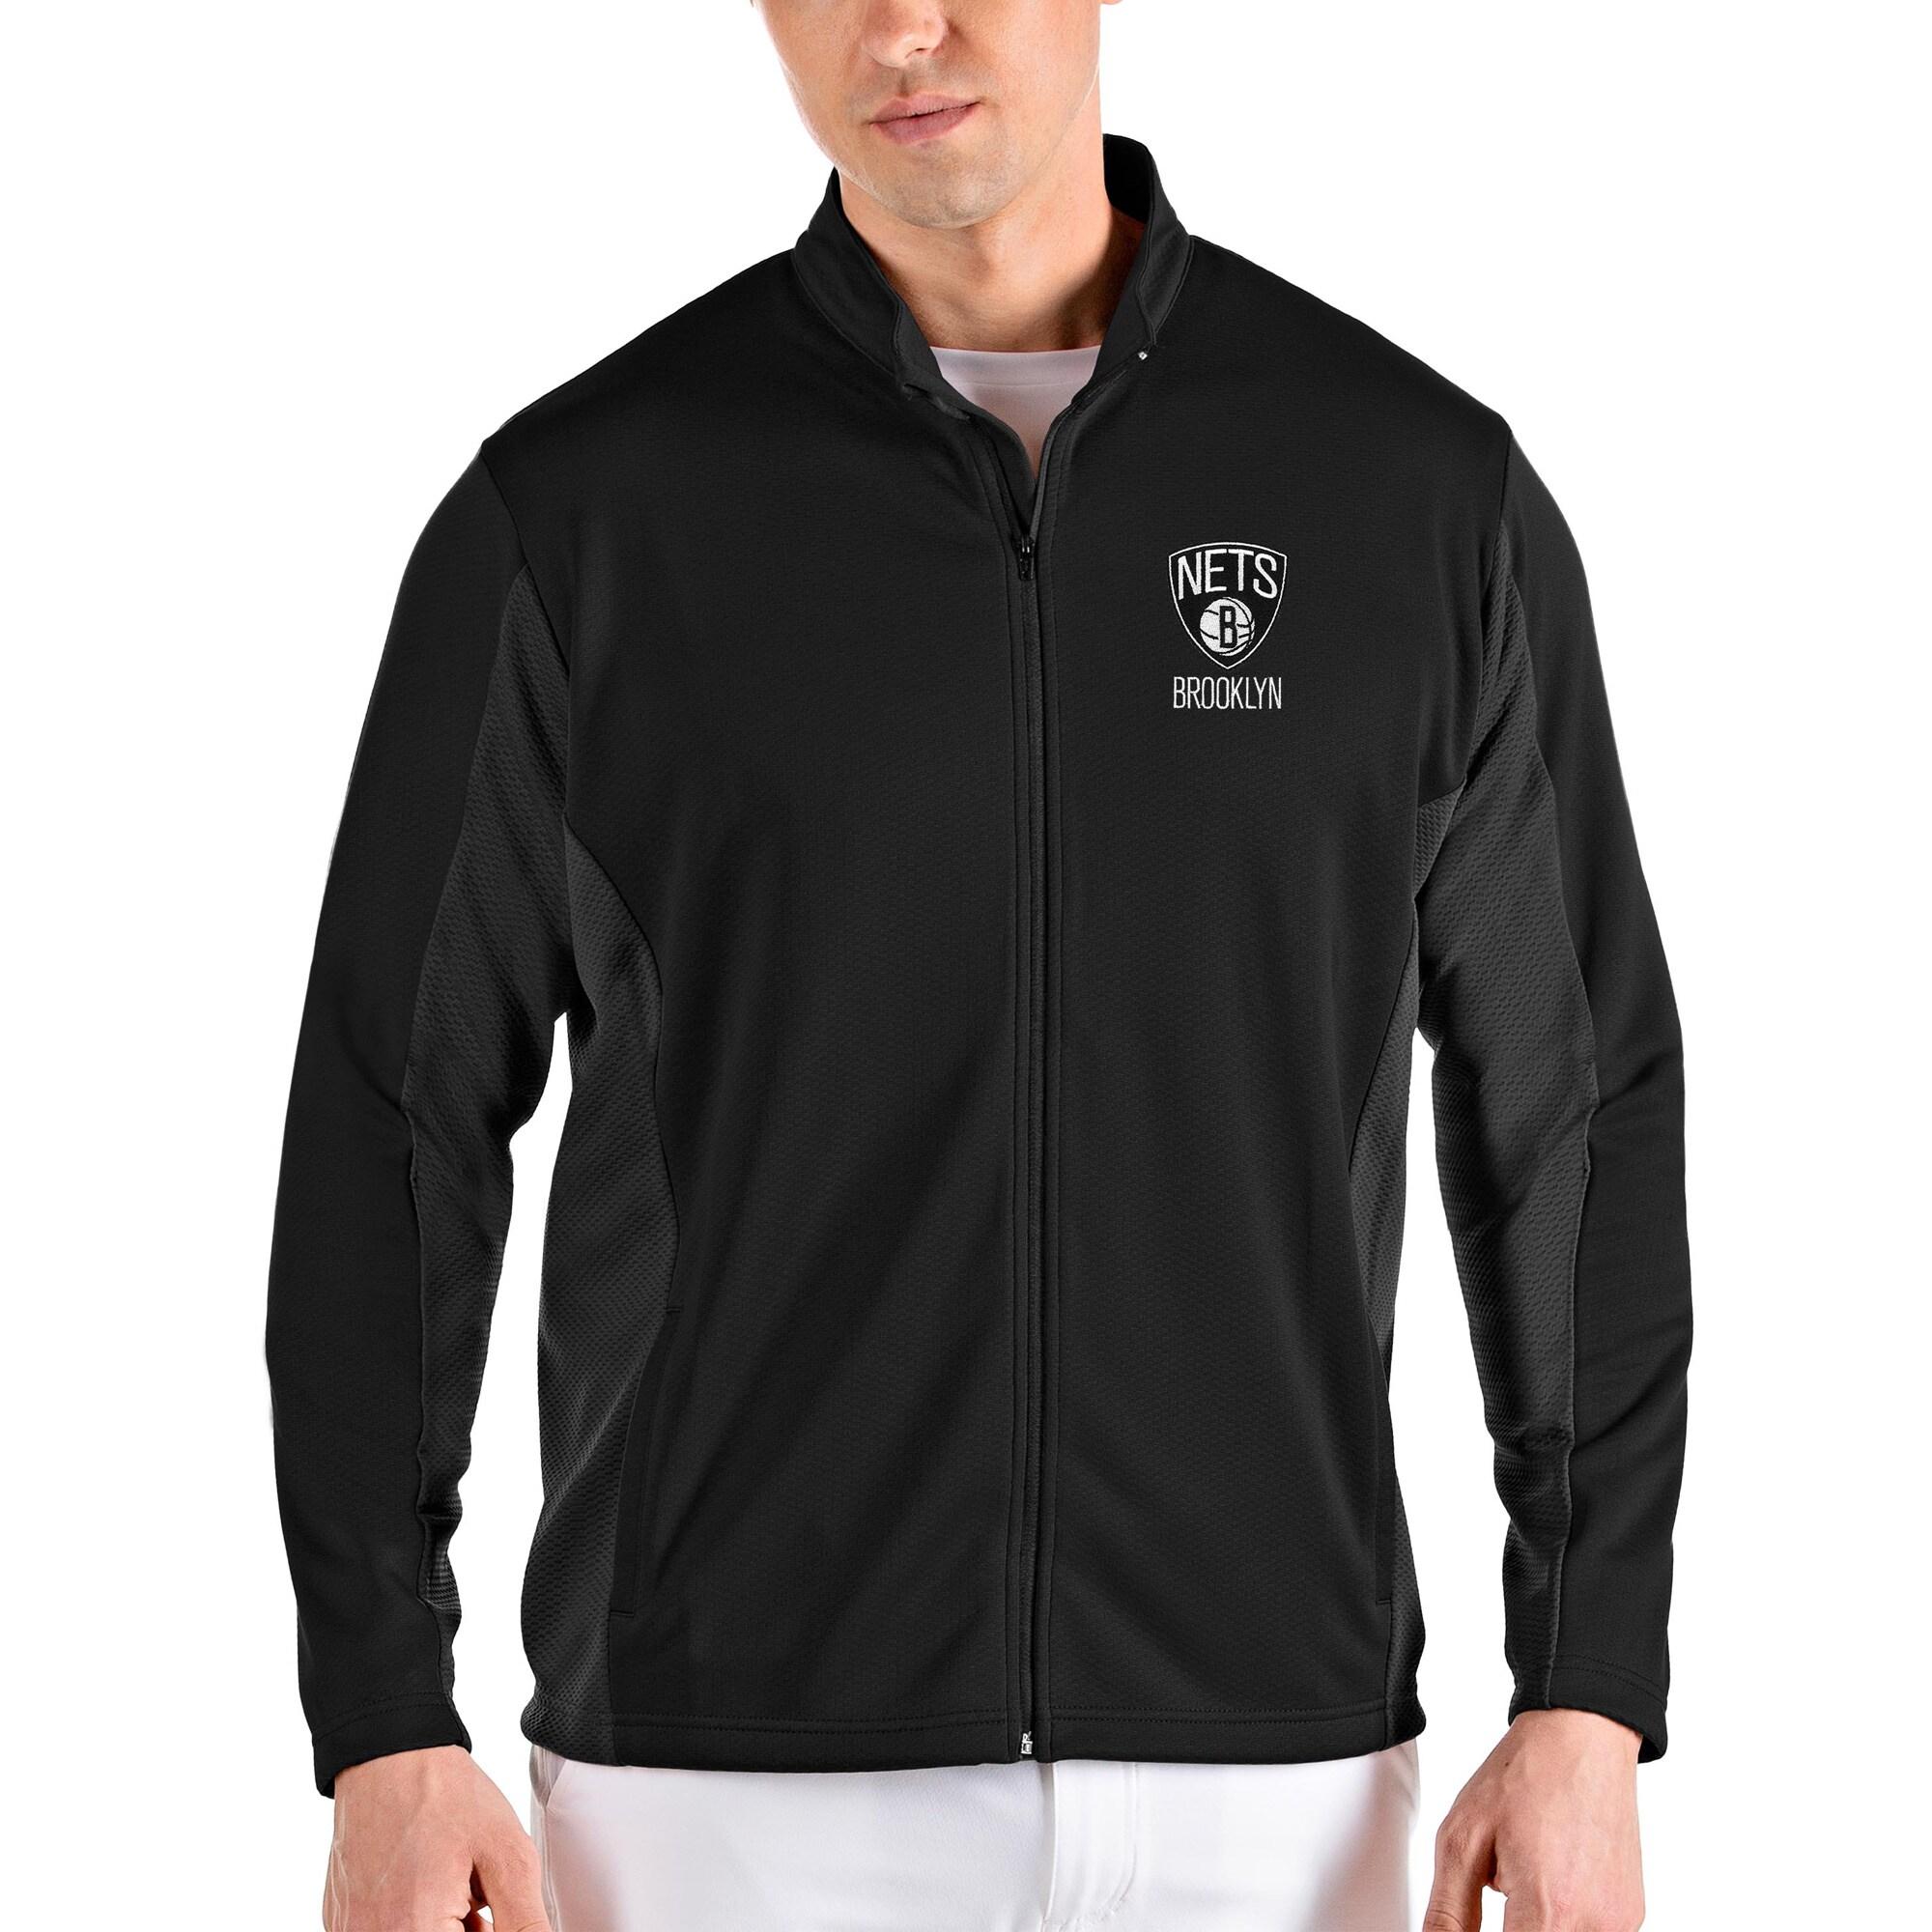 Brooklyn Nets Antigua Passage Full-Zip Jacket - Black/Gray